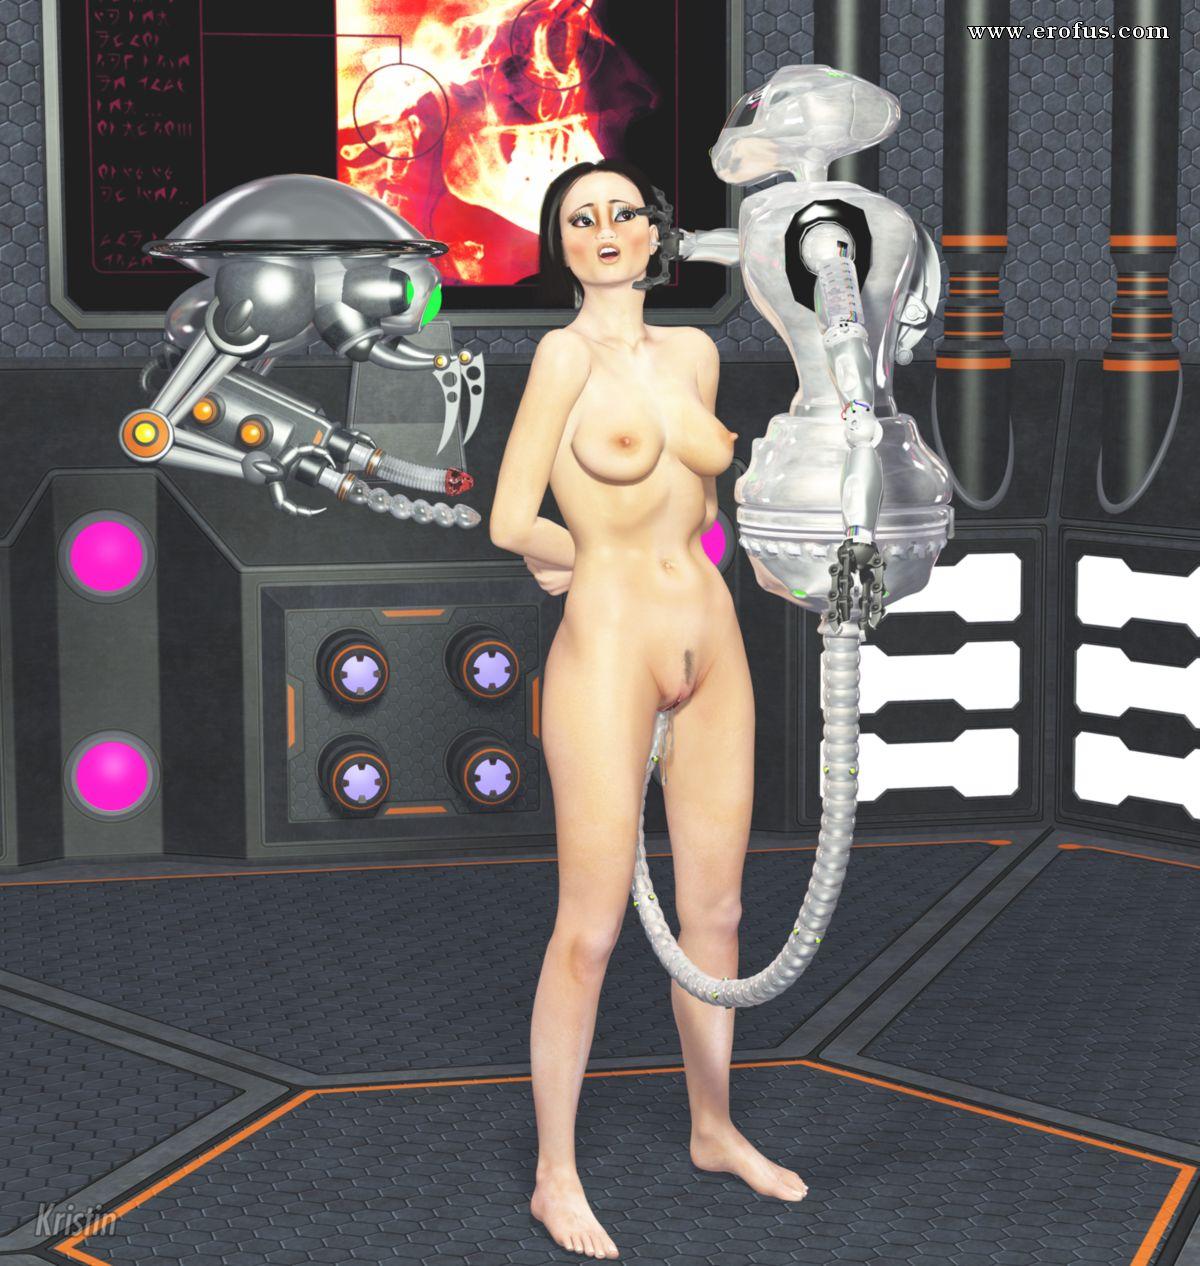 Top Scifi Sex Sites